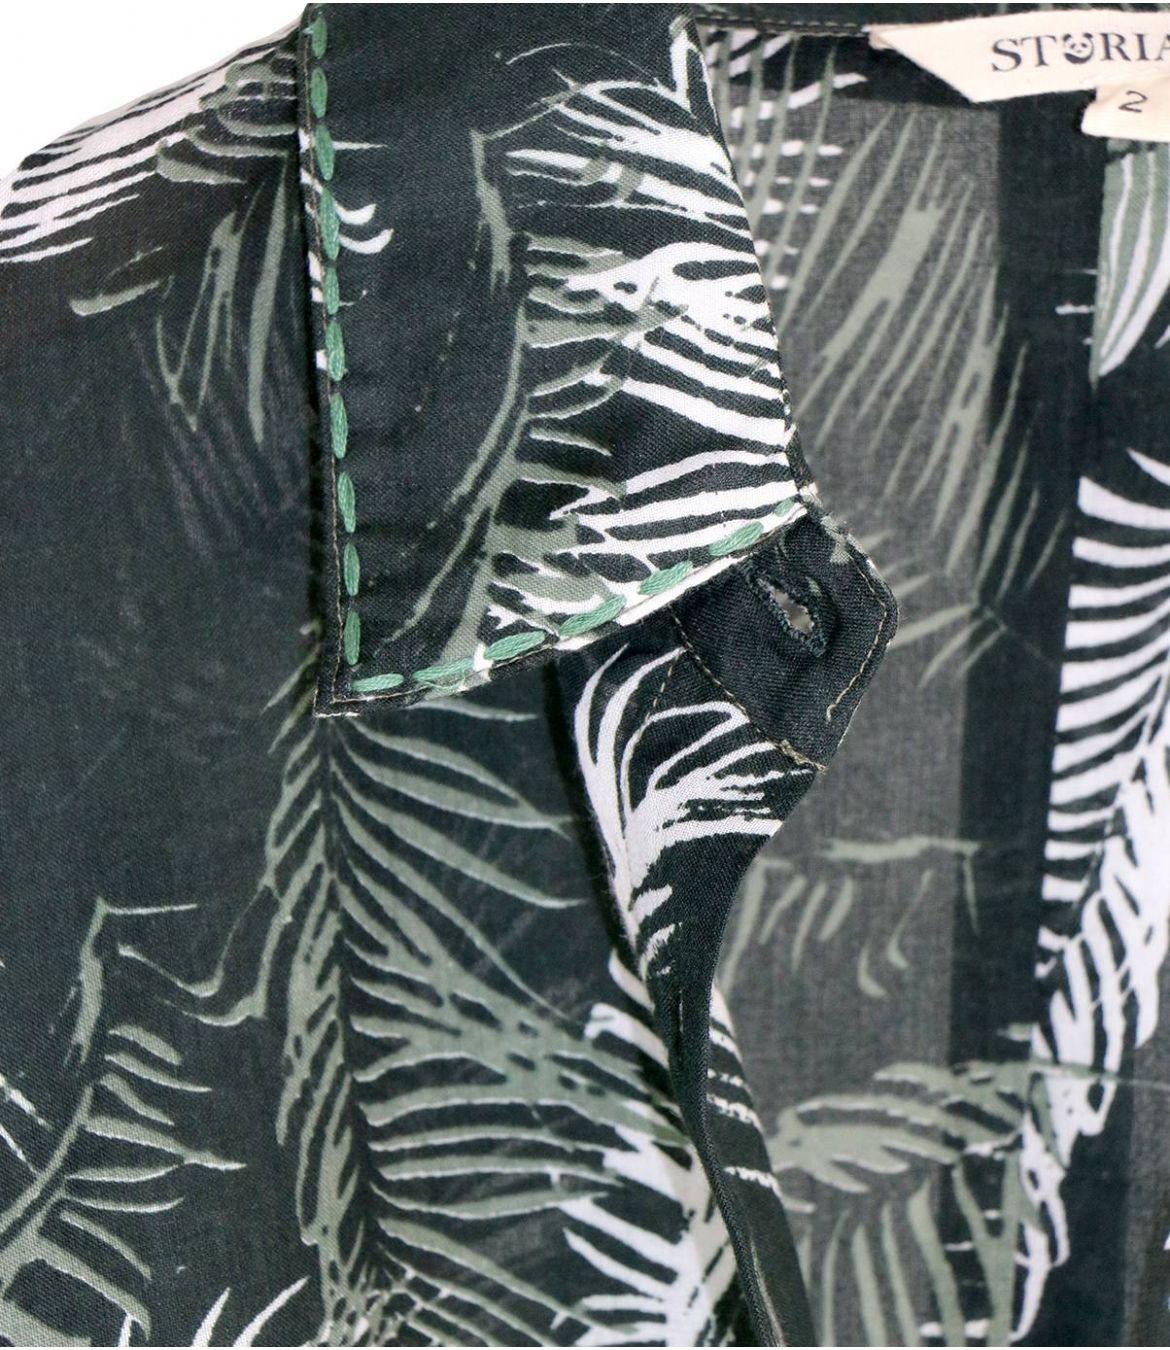 COSY PALOMA Cotton Shirt for Women Storiatipic - 3